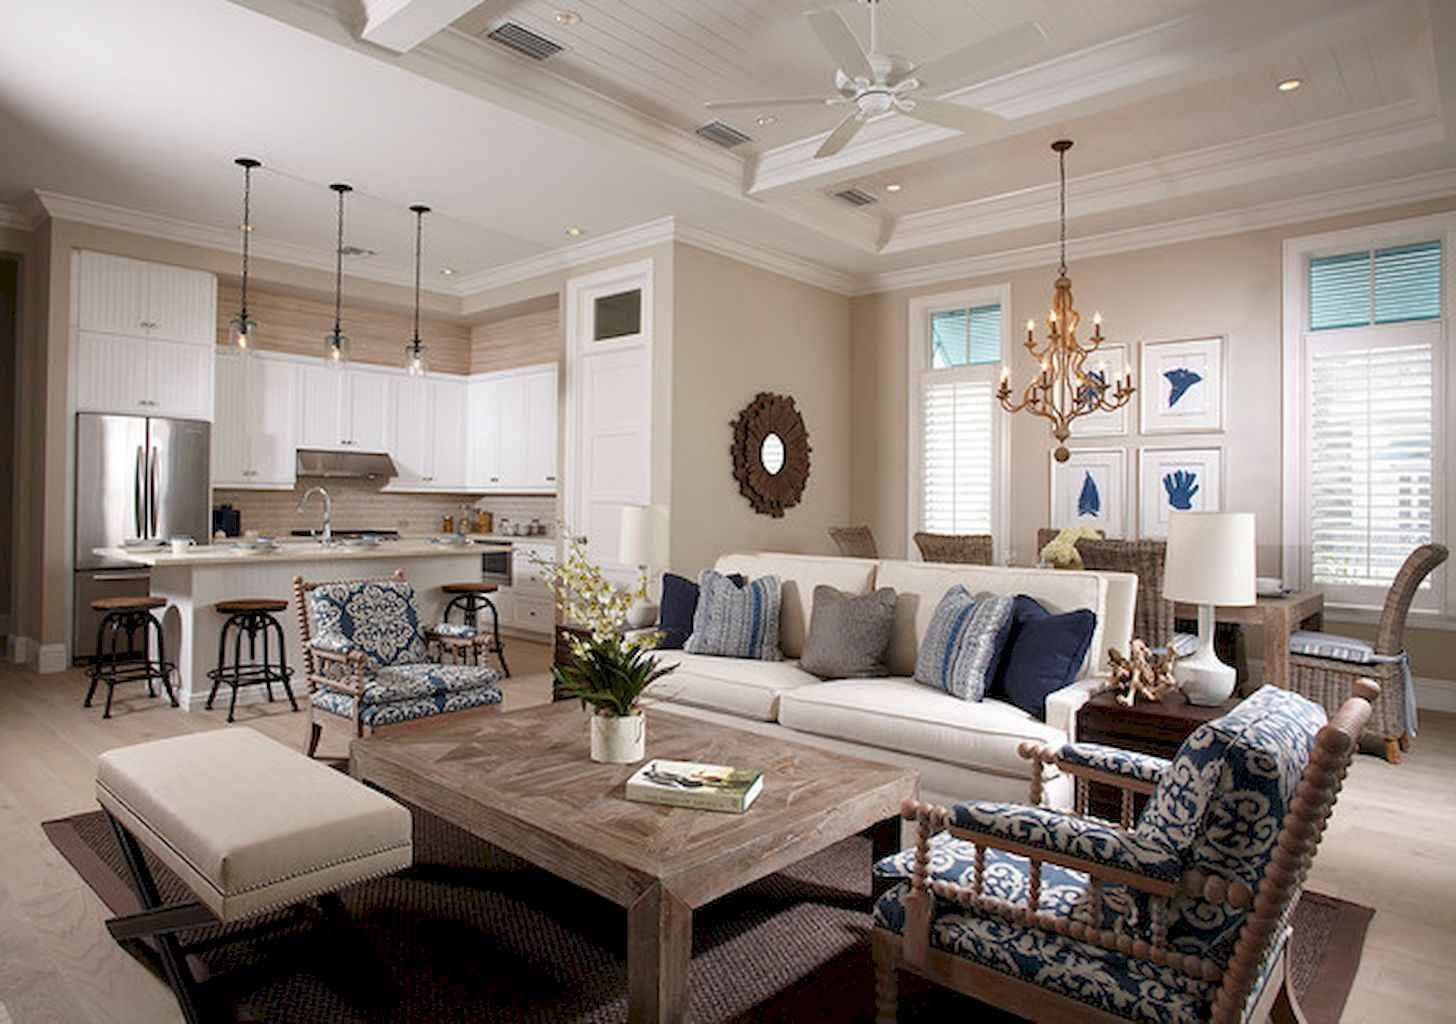 70 Rustic Farmhouse Living Room Decor Ideas (25)